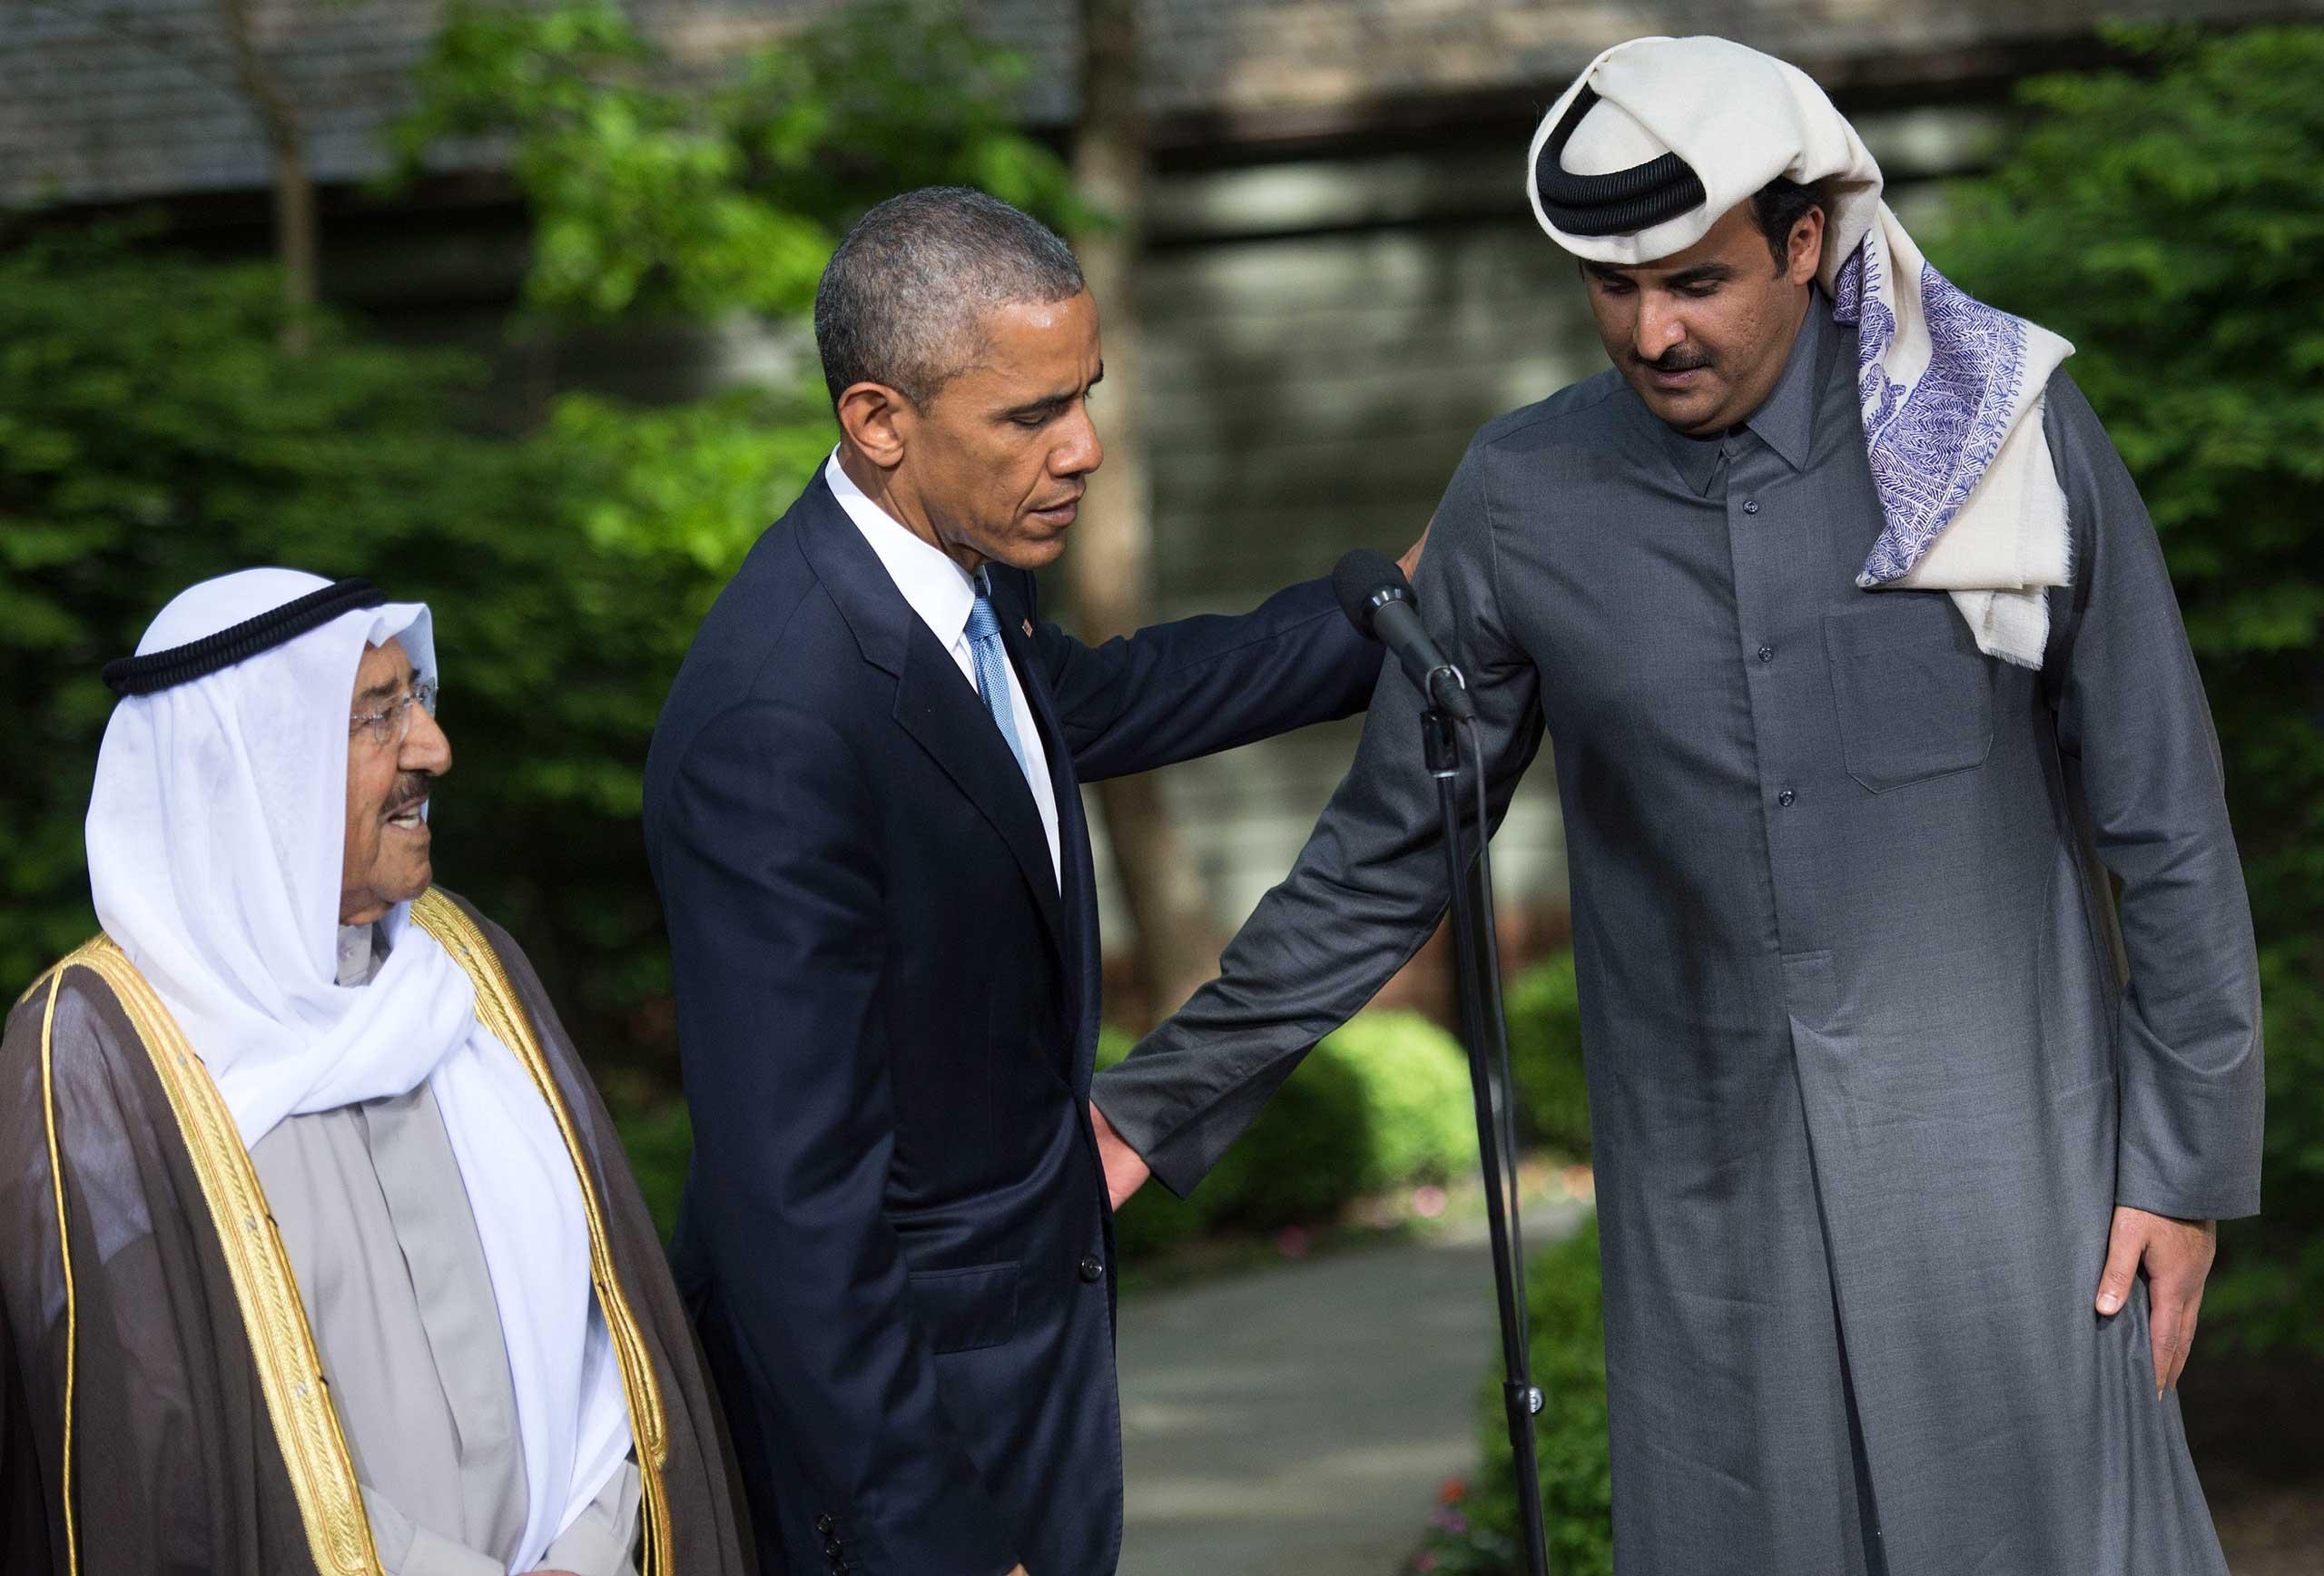 Obama encourages Kuwaiti Emir Sheikh Sabah Al-Ahmad Al-Sabah to make a statement alongside Qatar's Emir Sheikh Tamim bin Hamad Al-Thani, following the Gulf Cooperation Council-U.S. summit at Camp David on May 14, 2015.